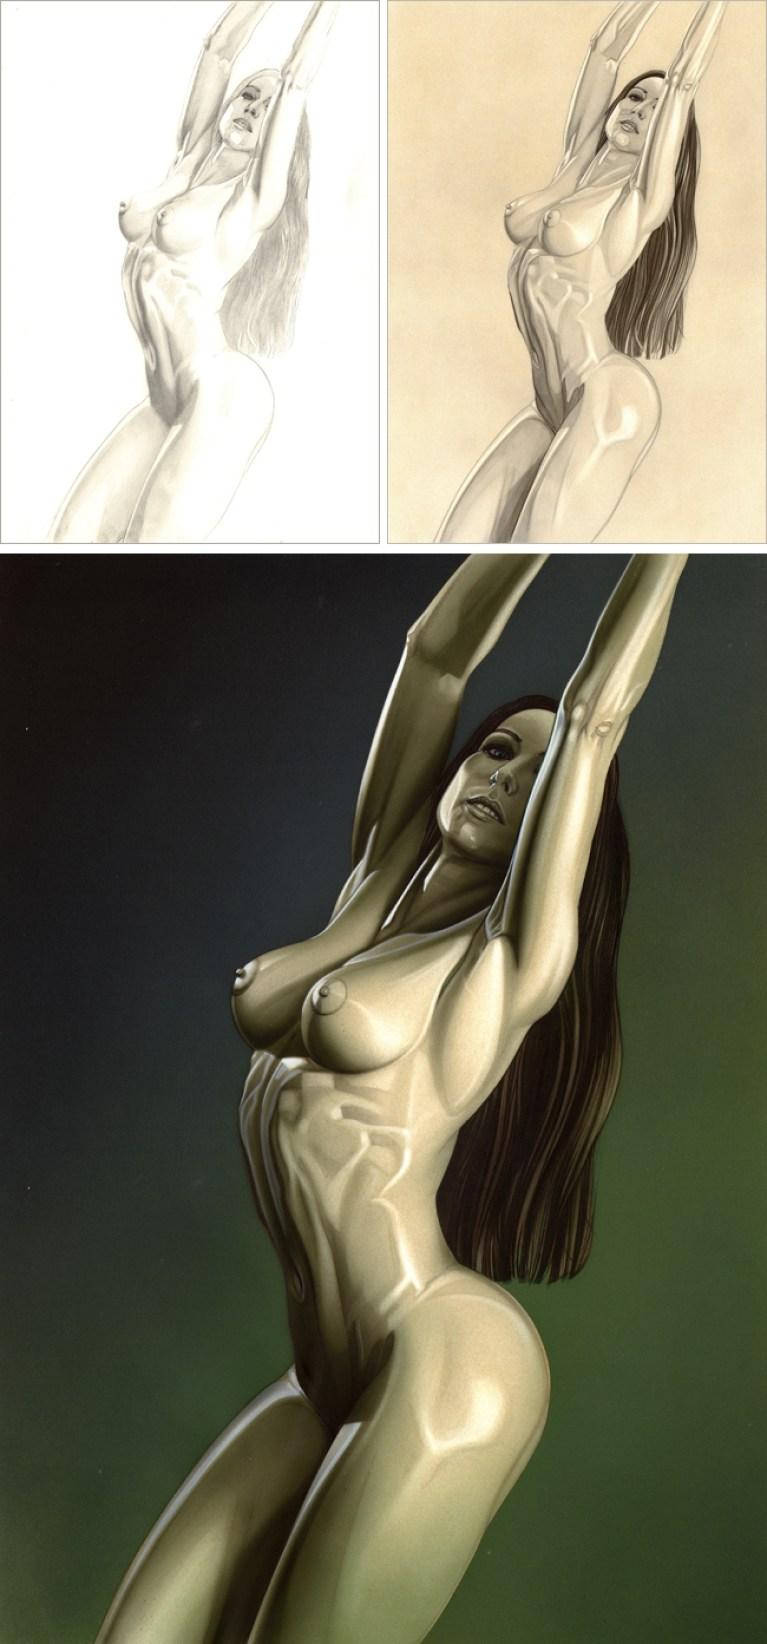 Ilustracion de aerografo en aerografia de Carlos Diez.